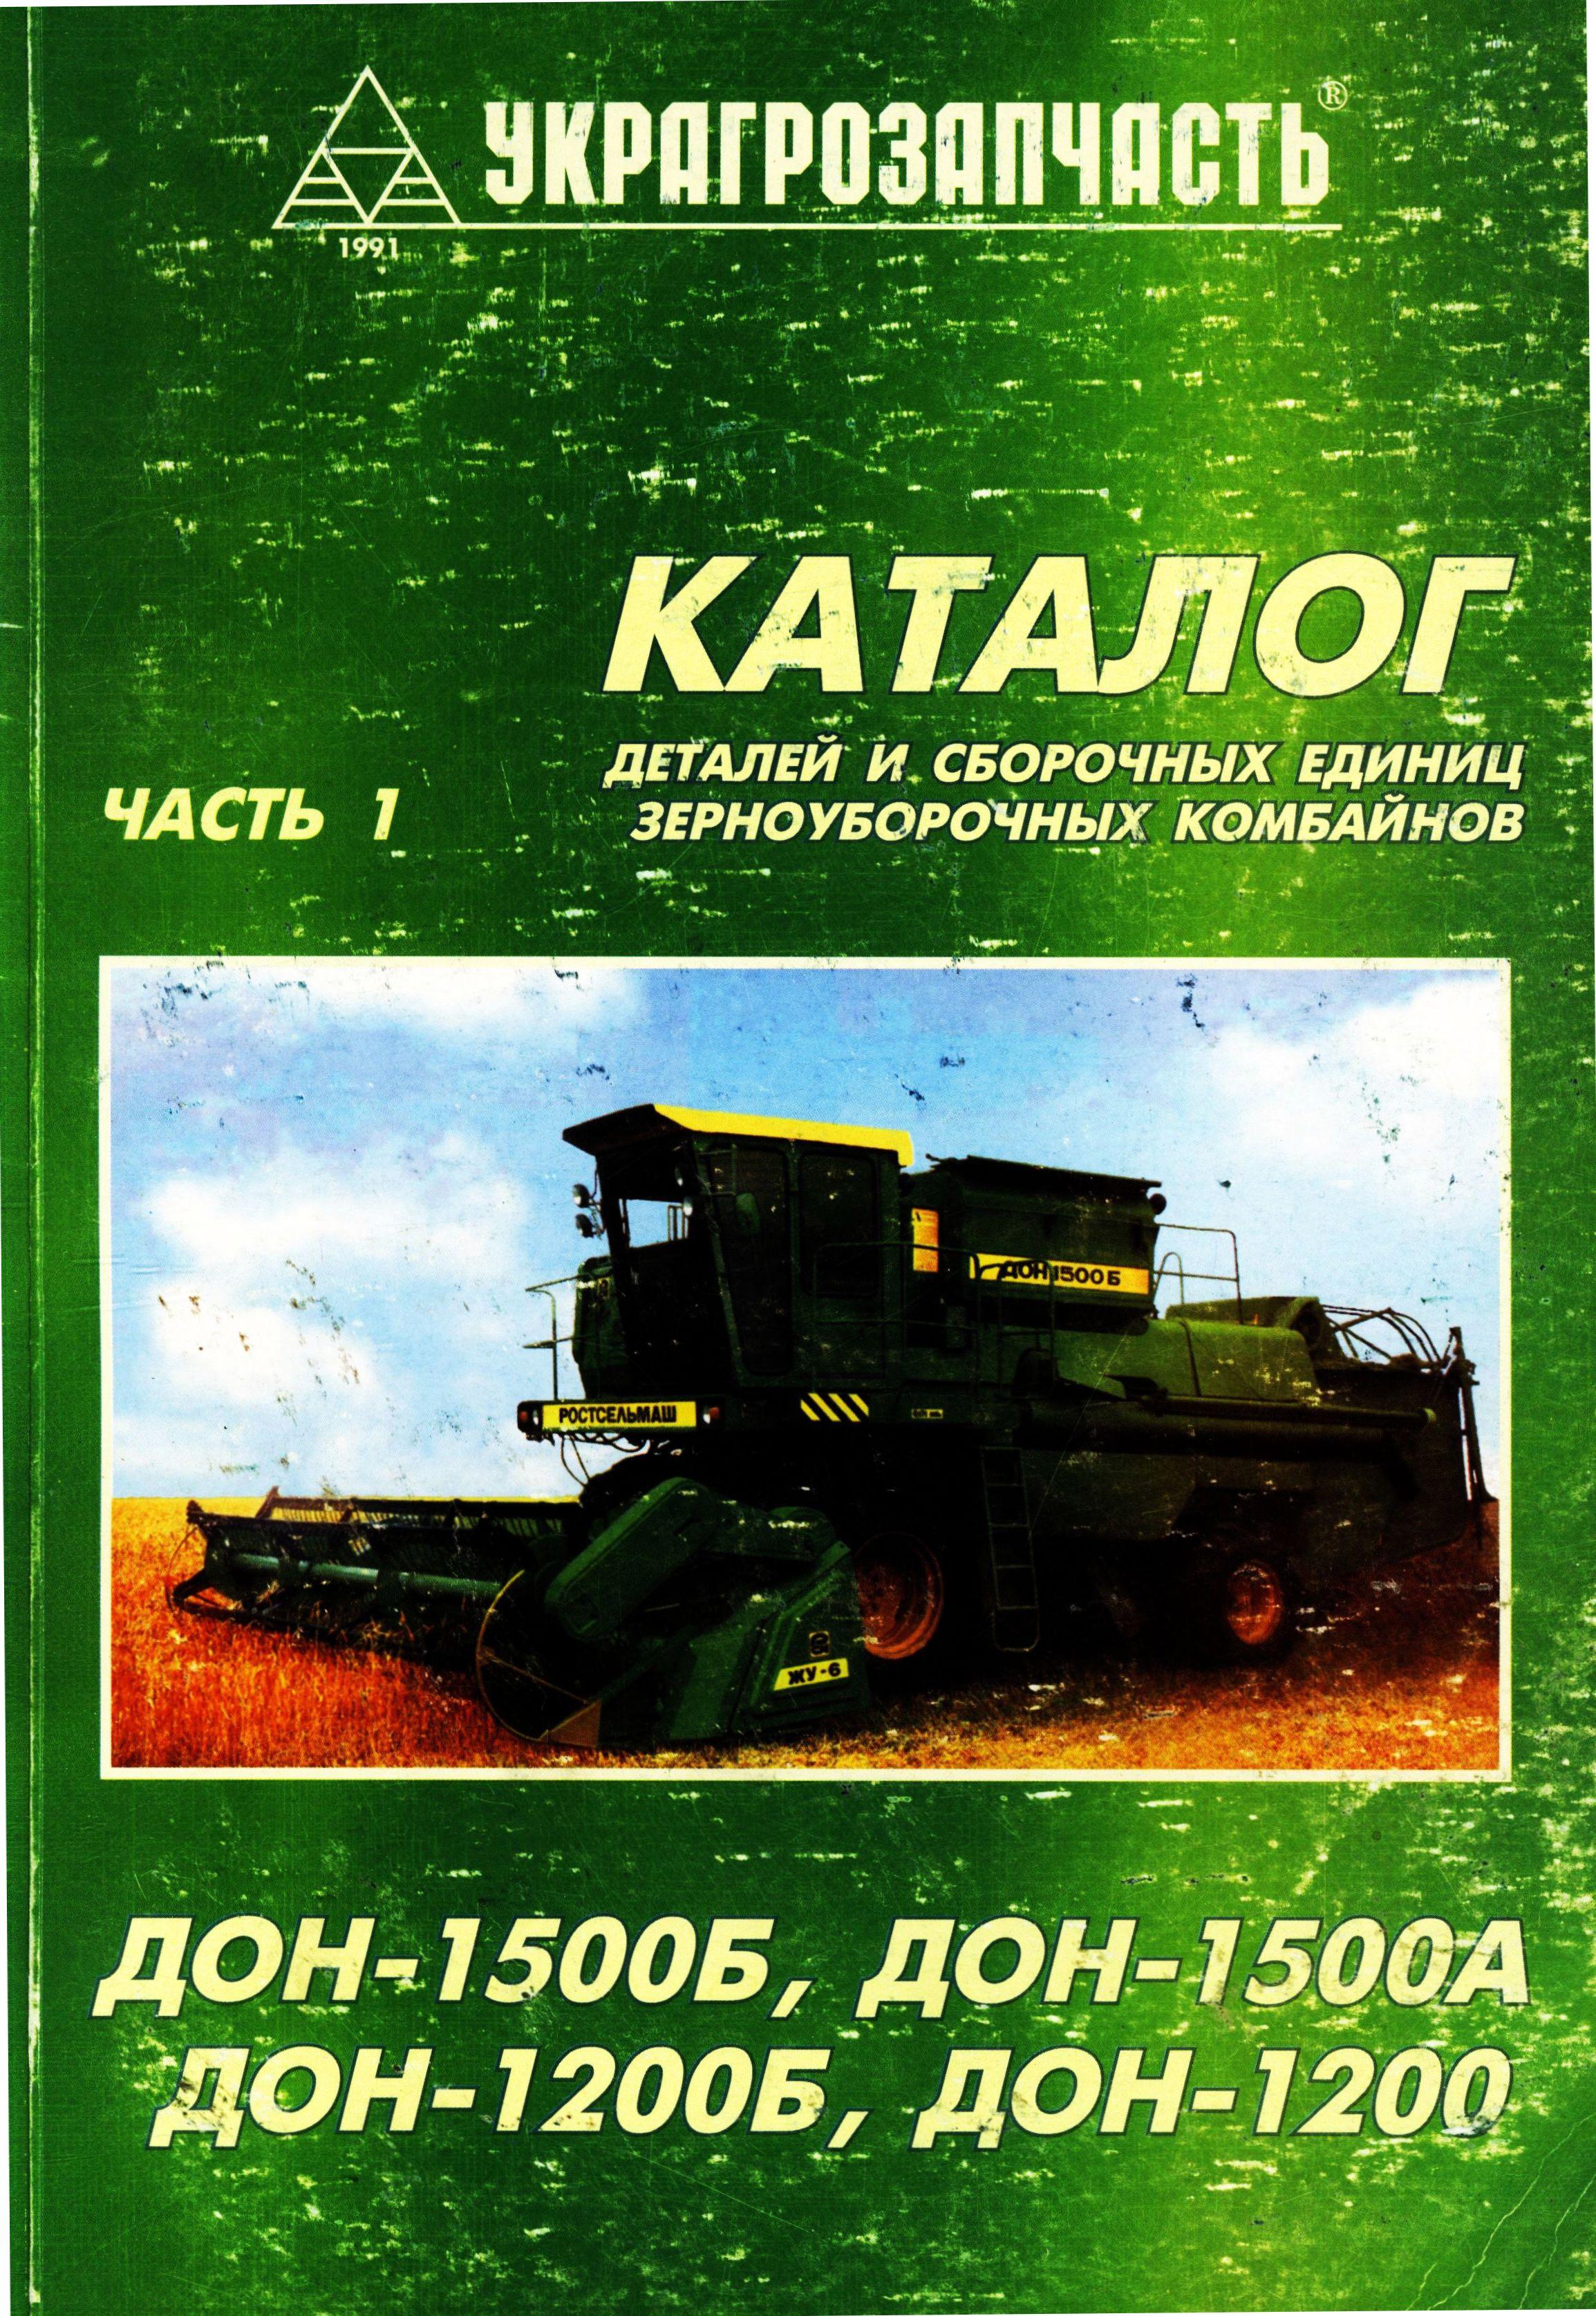 Комбайн ДОН-1500Б, ДОН-1500А, ДОН-1200Б Каталог деталей